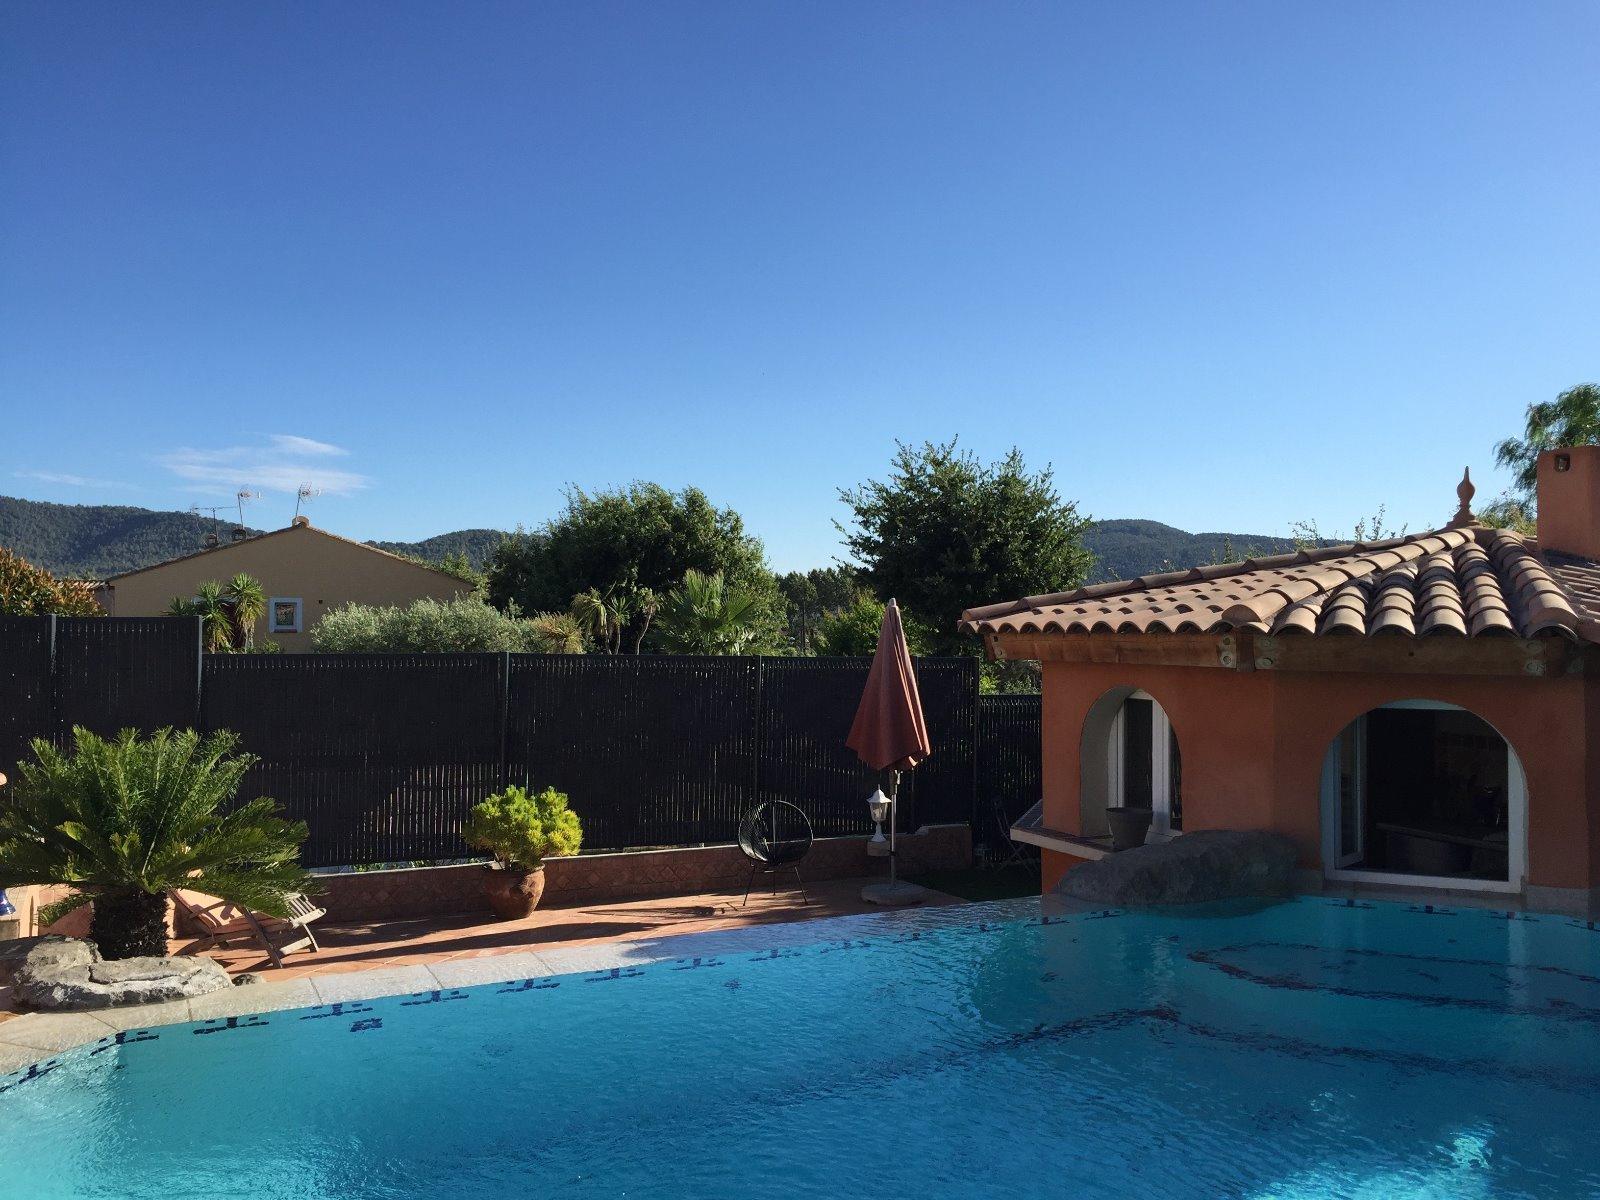 Vente hy res proche commodit s villa avec piscine for Villa piscine debordement